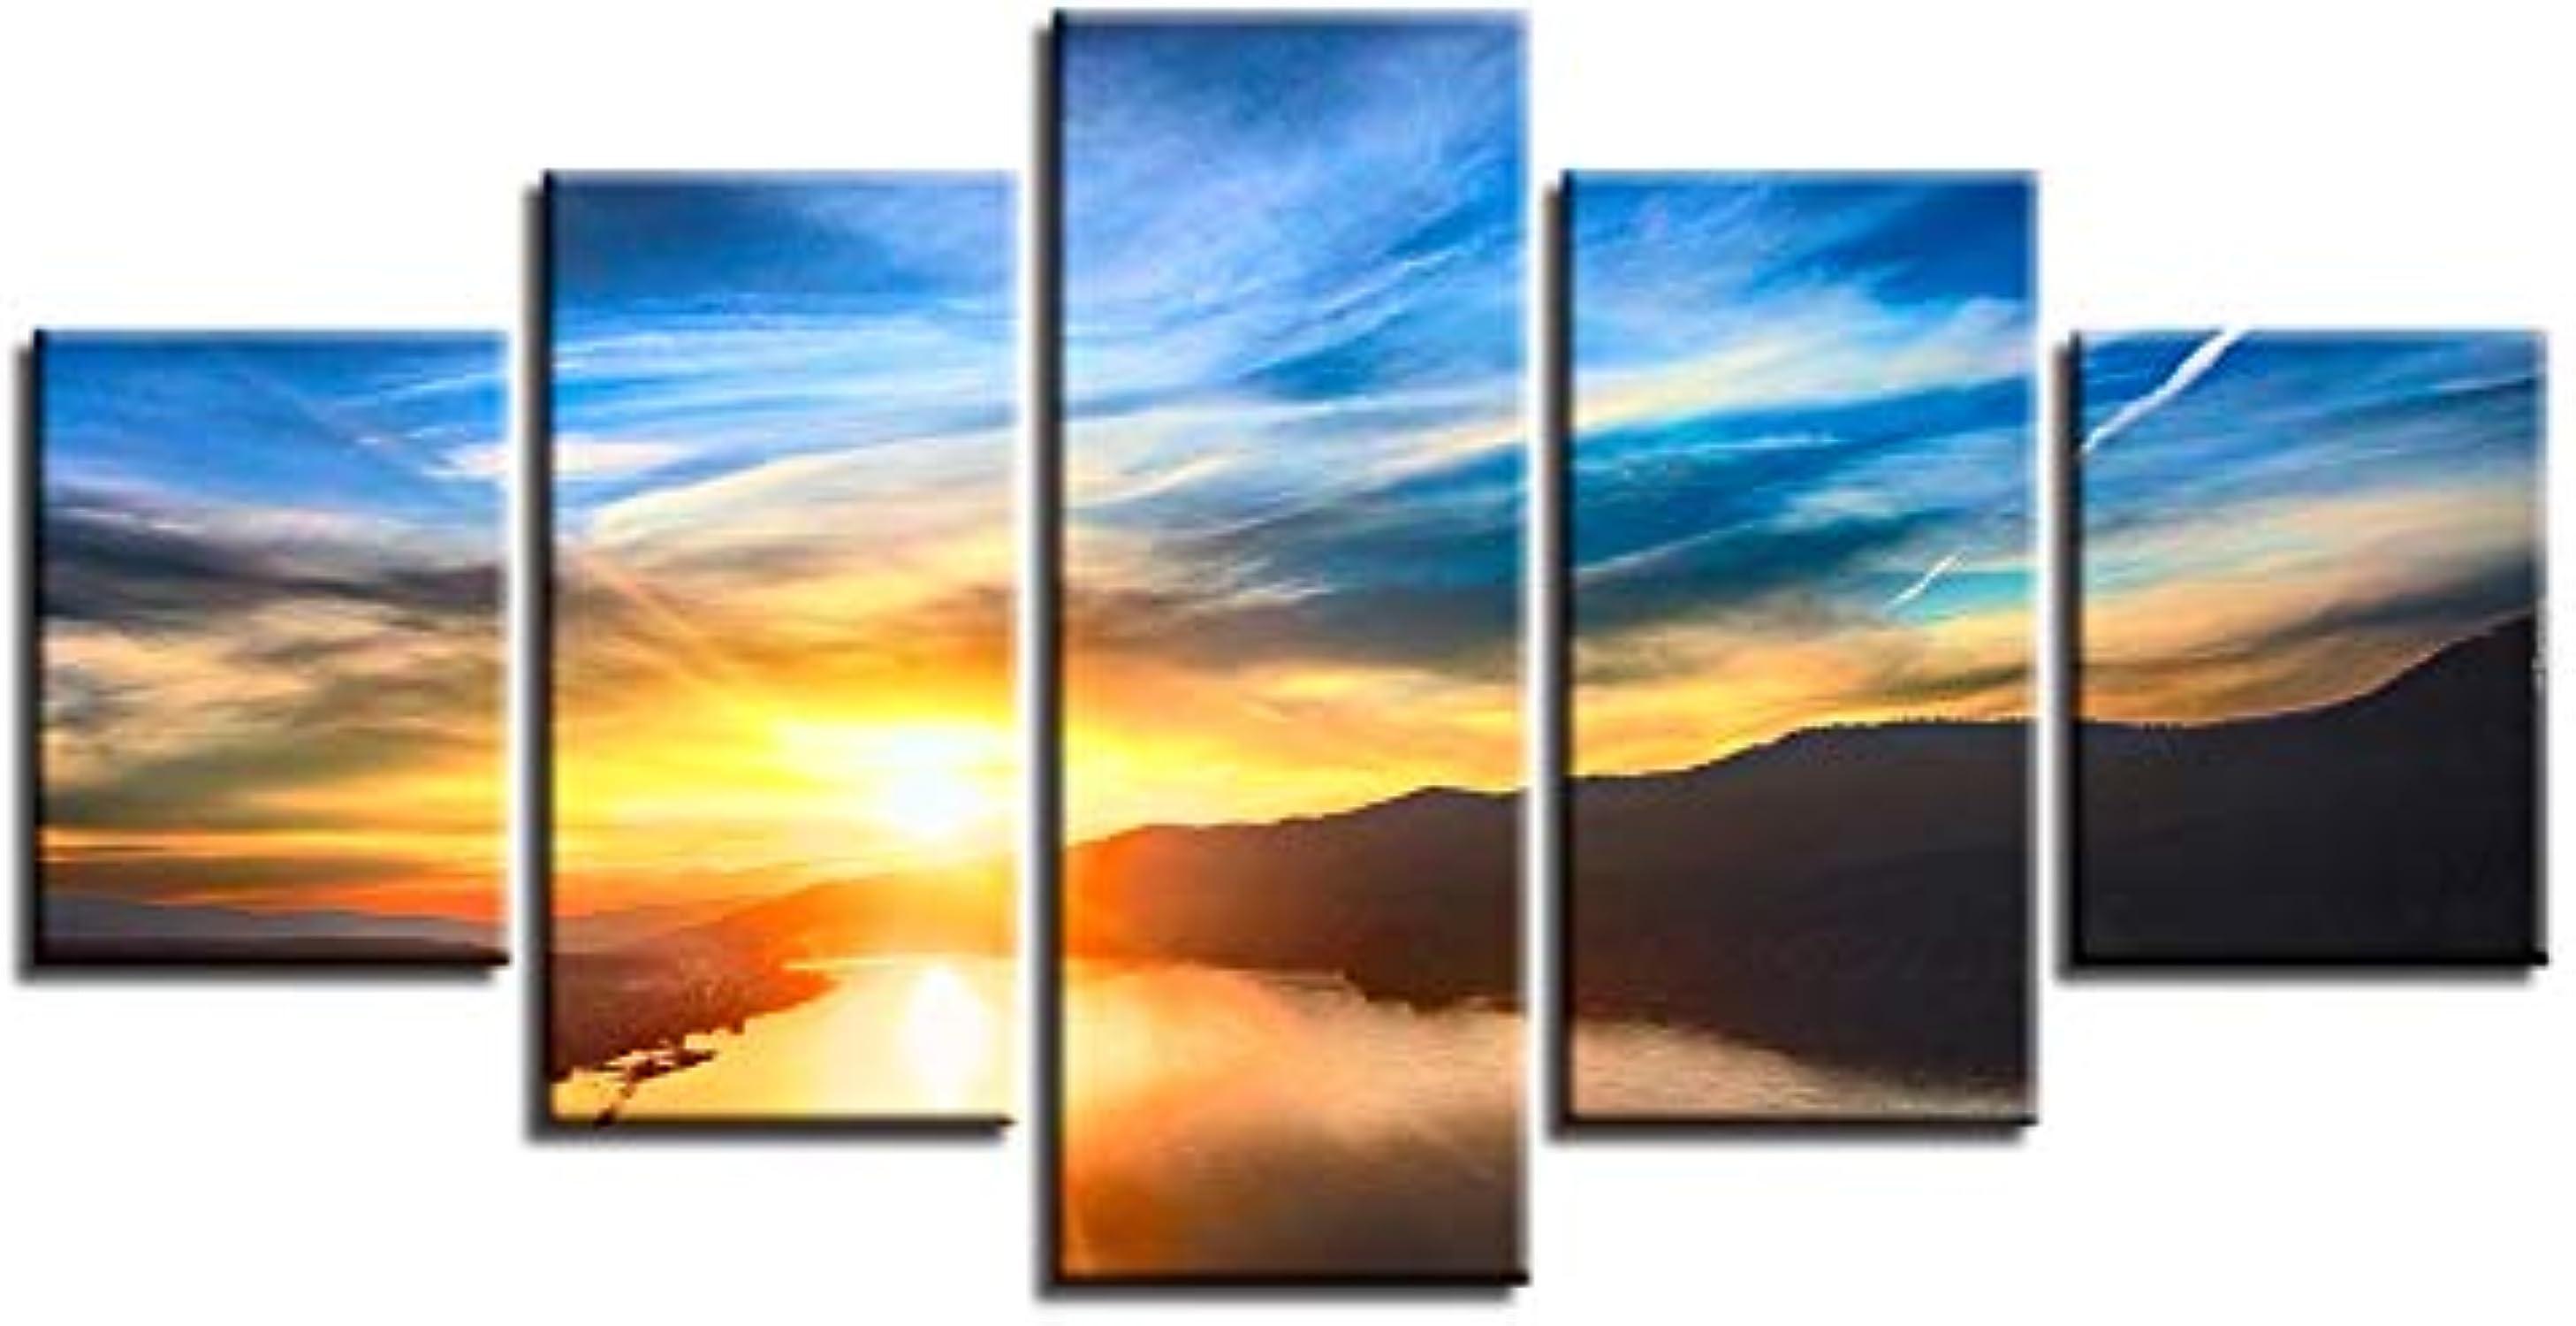 RMRM Marco HD Impreso Decoración Habitación Arte de la Parojo 5 Piezas Mountain Lake Cielo Azul Nube blancoa Imagen de póster Modular Sunset Paisaje Lienzo de Pintura 20x35cm20x45cm 20x55cm